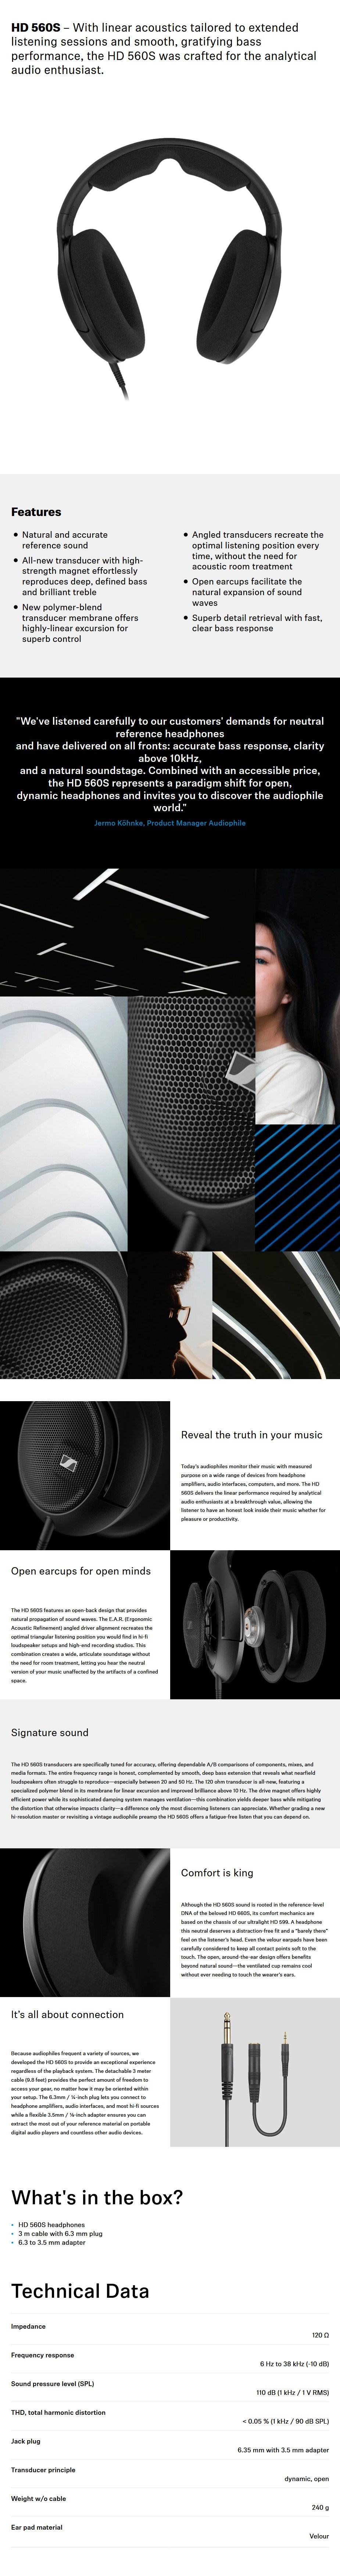 Sennheiser HD 560S Open-Back Dynamic Headphones - Desktop Overview 1